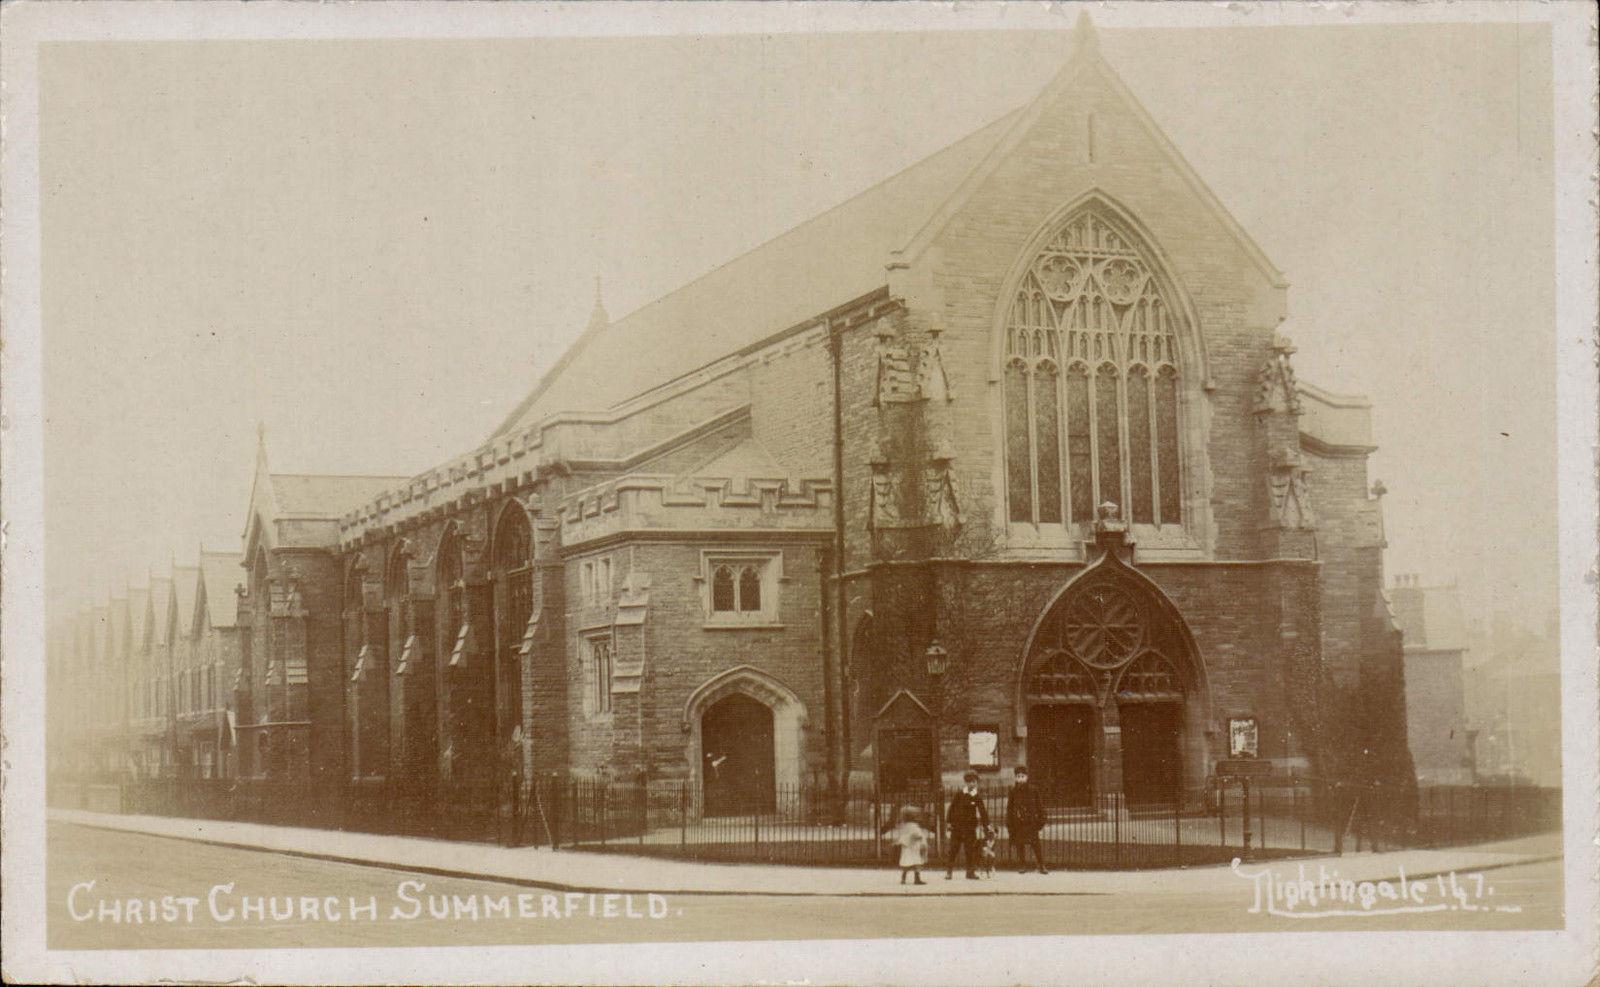 File:Christ Church, Summerfield, Birmingham, England - postcard.jpg